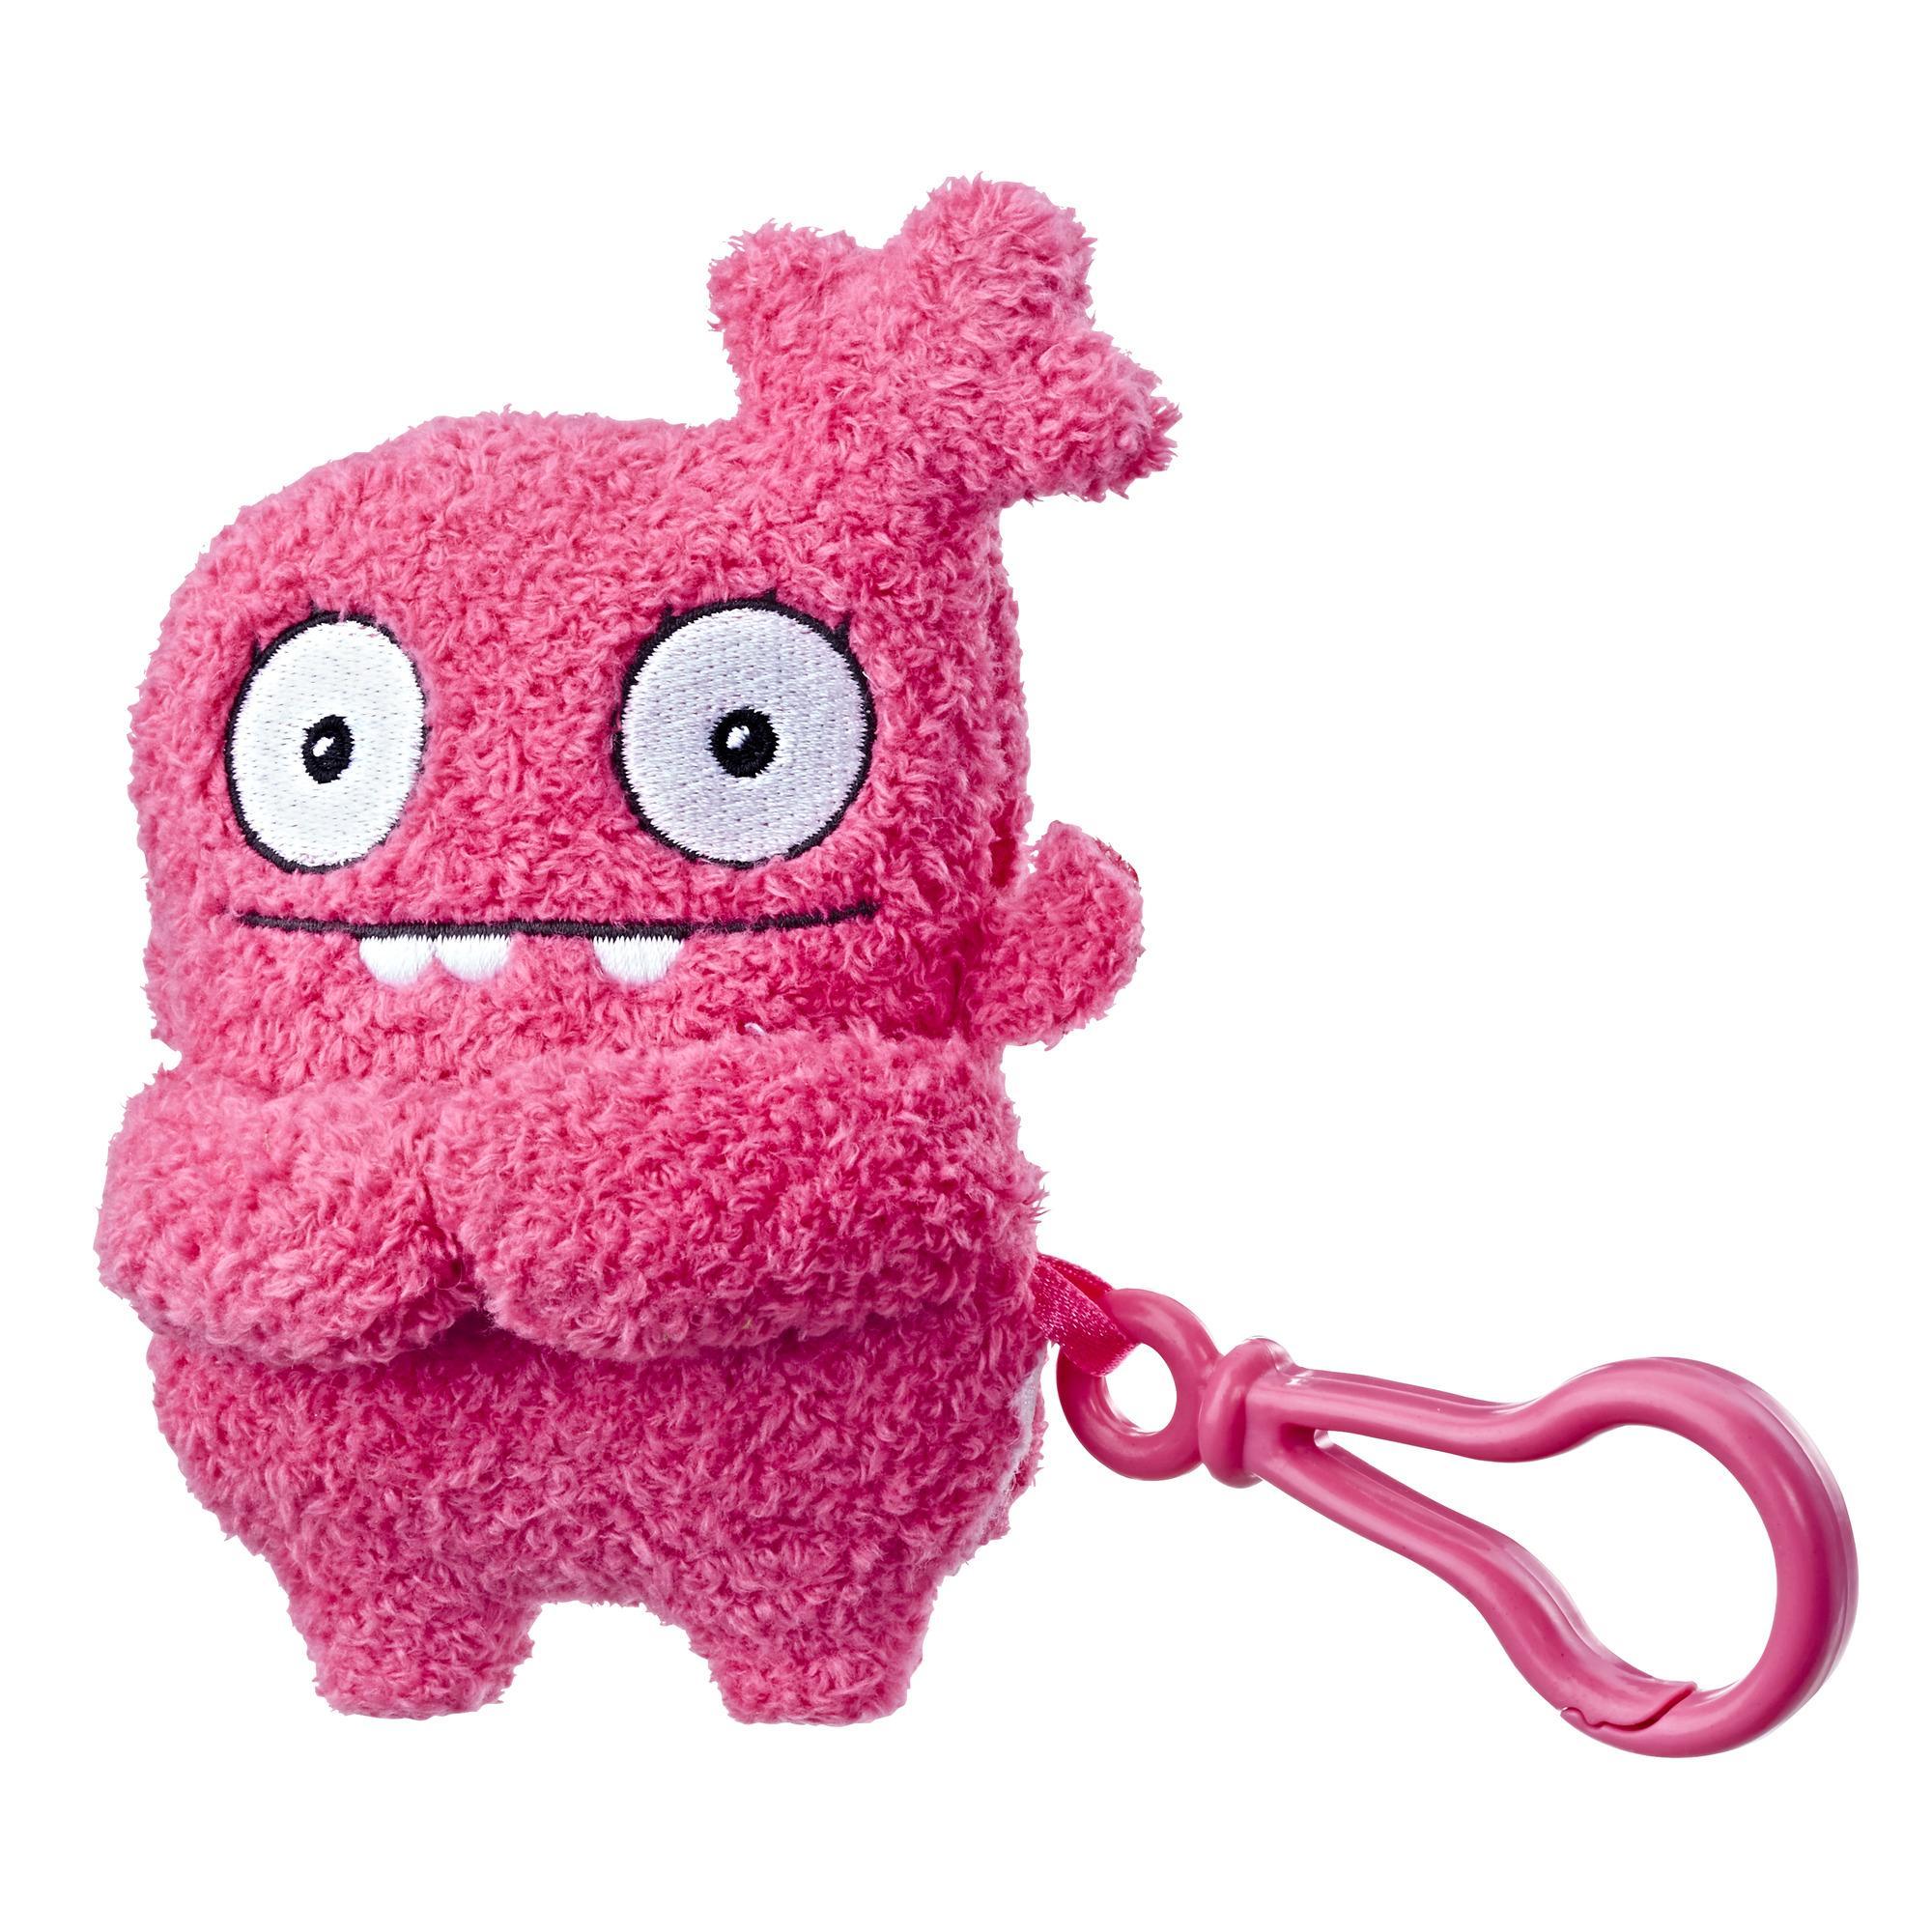 UglyDolls Moxy To-Go Stuffed Plush Toy, 5.5 inches tall